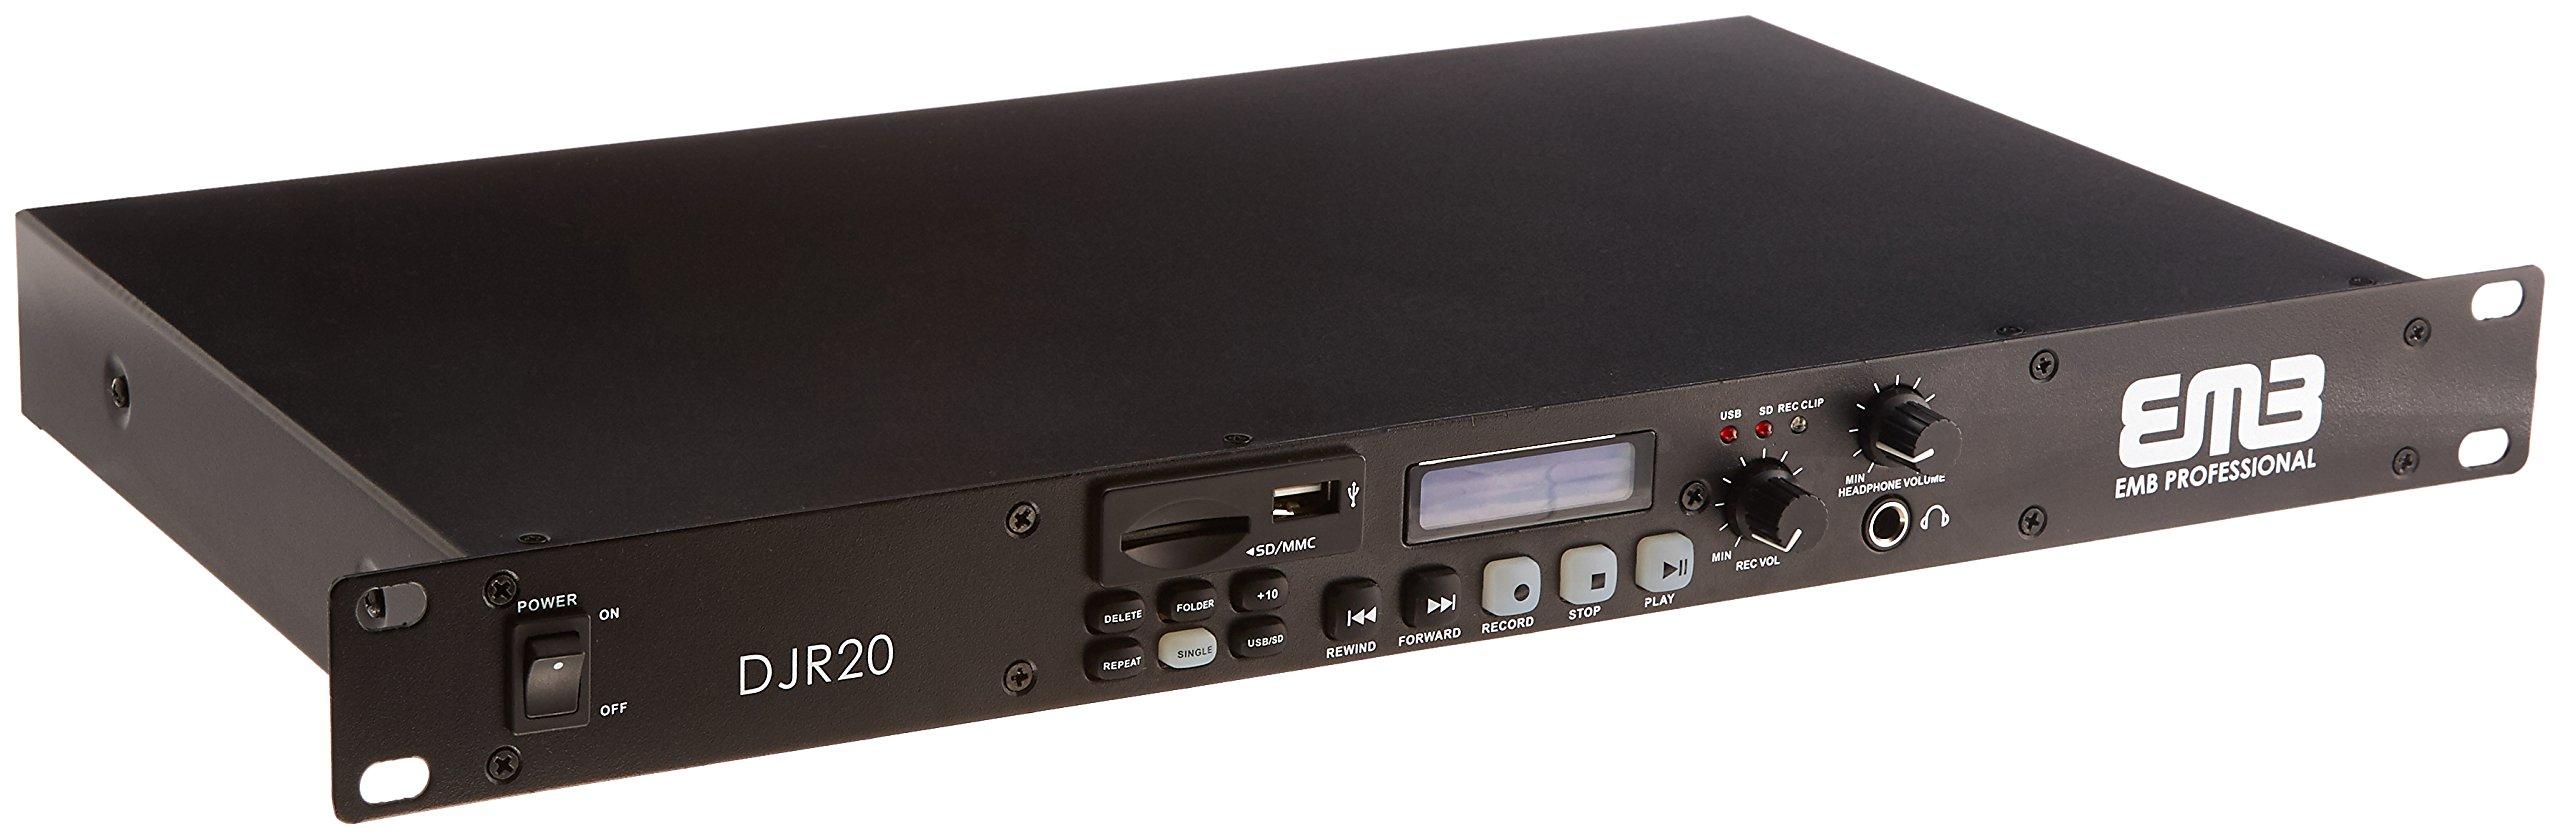 EMB Professional DJR20 1U SINGLE USB/SD Digital Player & Recorder Rack Mount